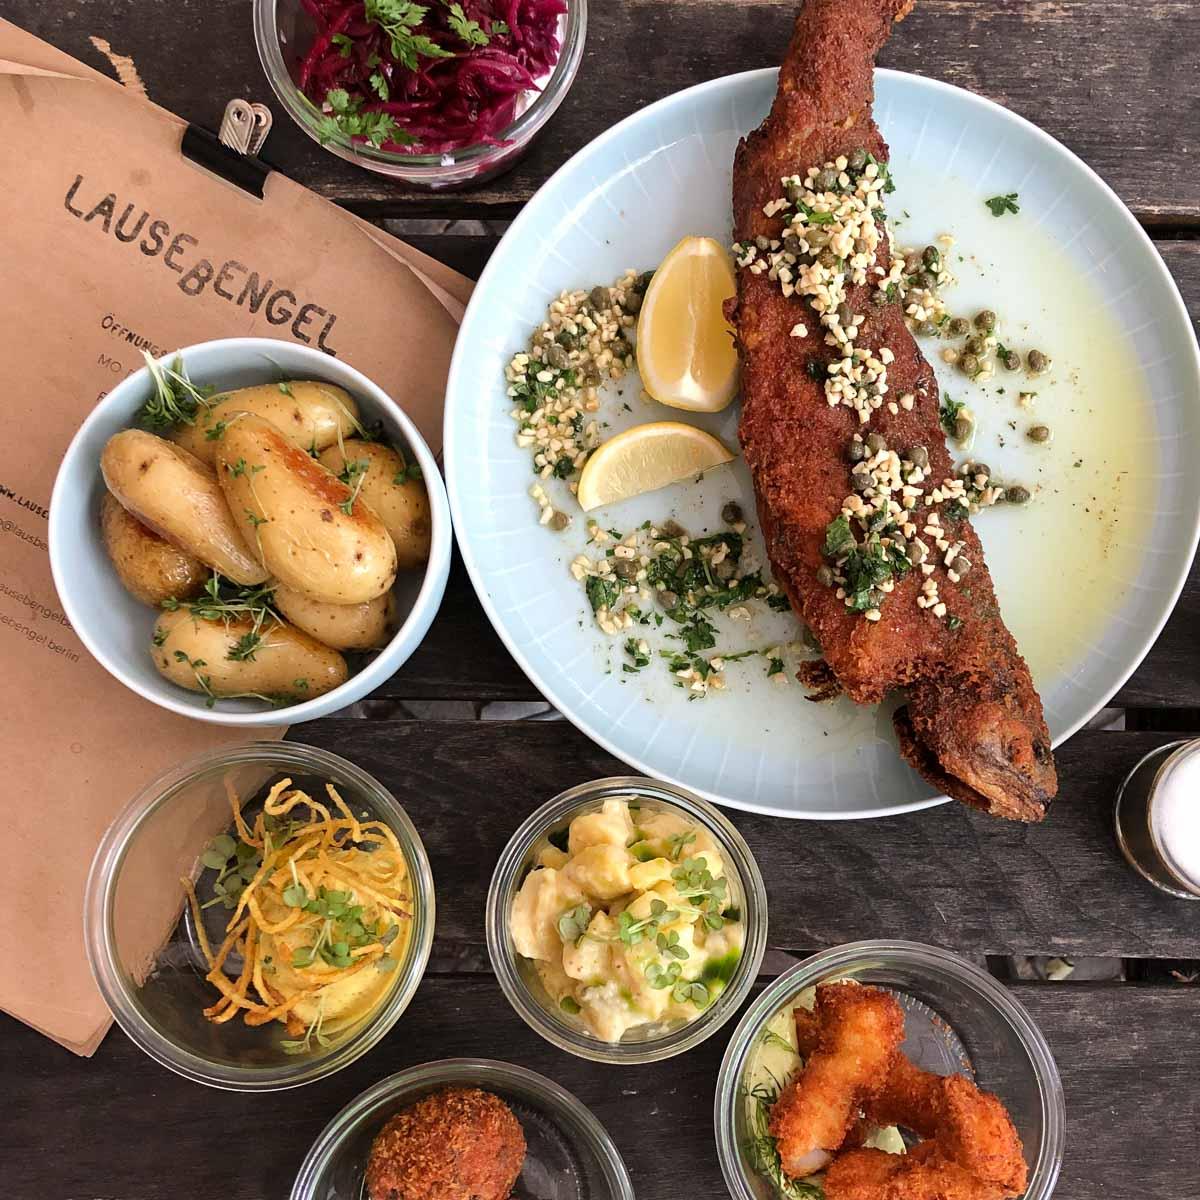 Restaurant Lausebengel in Berlin Salat